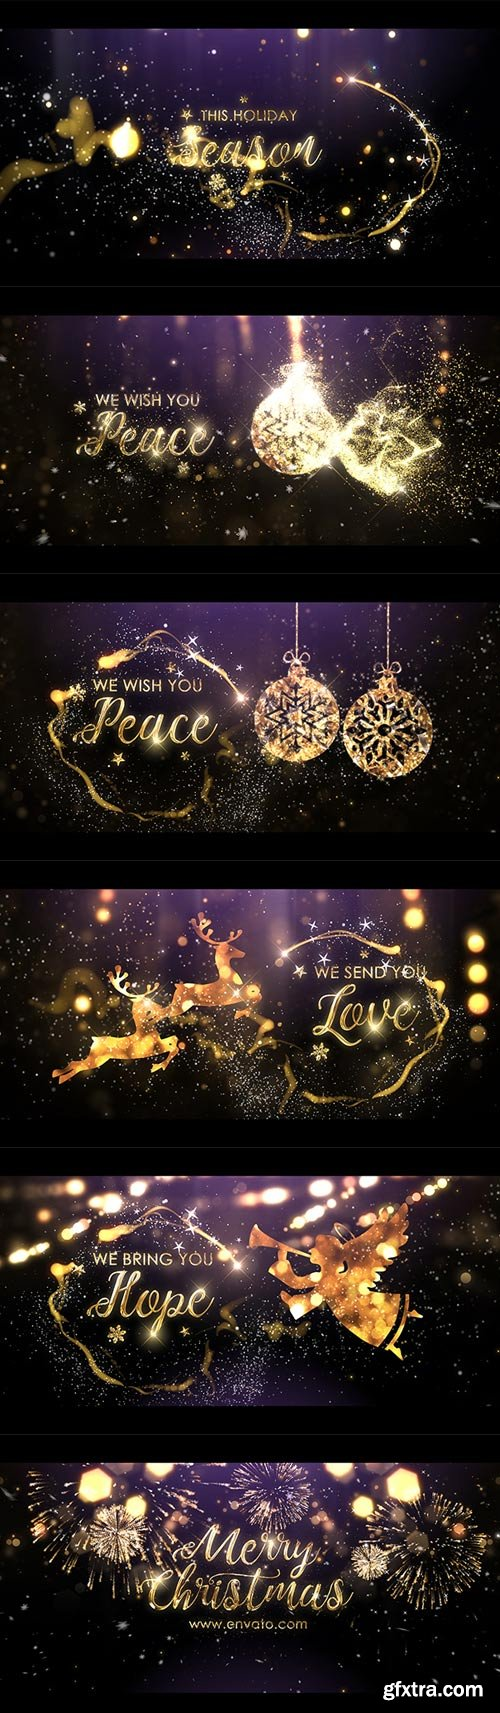 Videohive - Christmas - 22802936